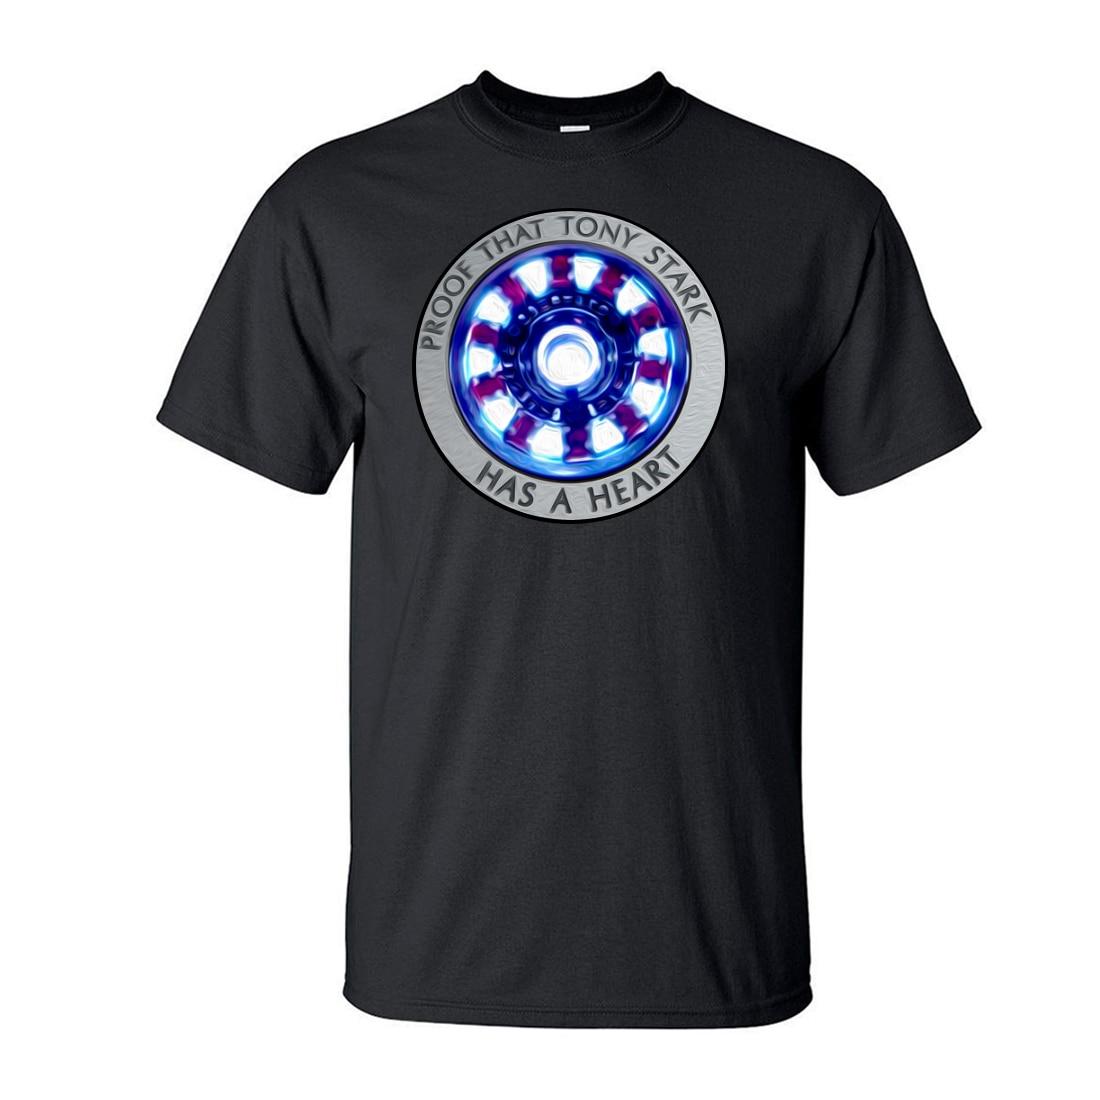 Tony Stark Heeft EEN Hart Logo Gedrukt T-Shirt Mannen 2019 Hot Zomer 100% Katoen Iron Man T-shirts Voor Volwassen hip Hop Streetwear BZ074